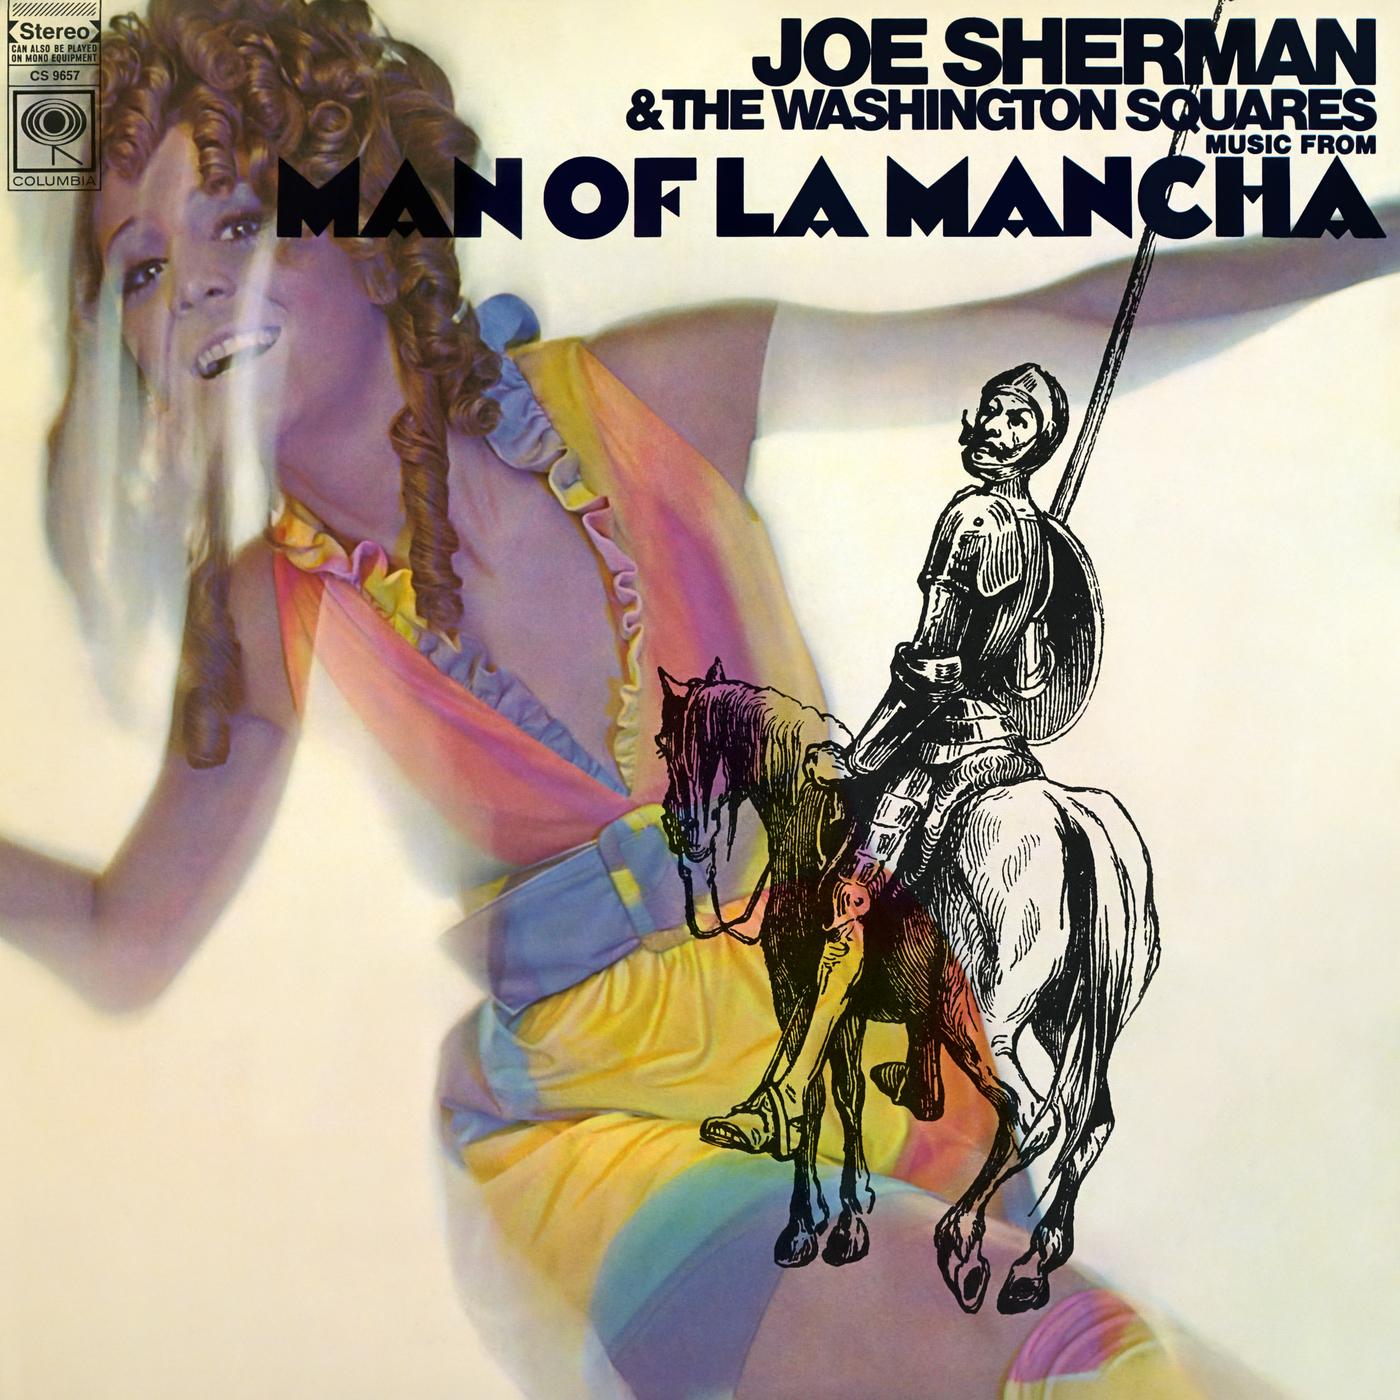 Music from Man of La Mancha - Joe Sherman